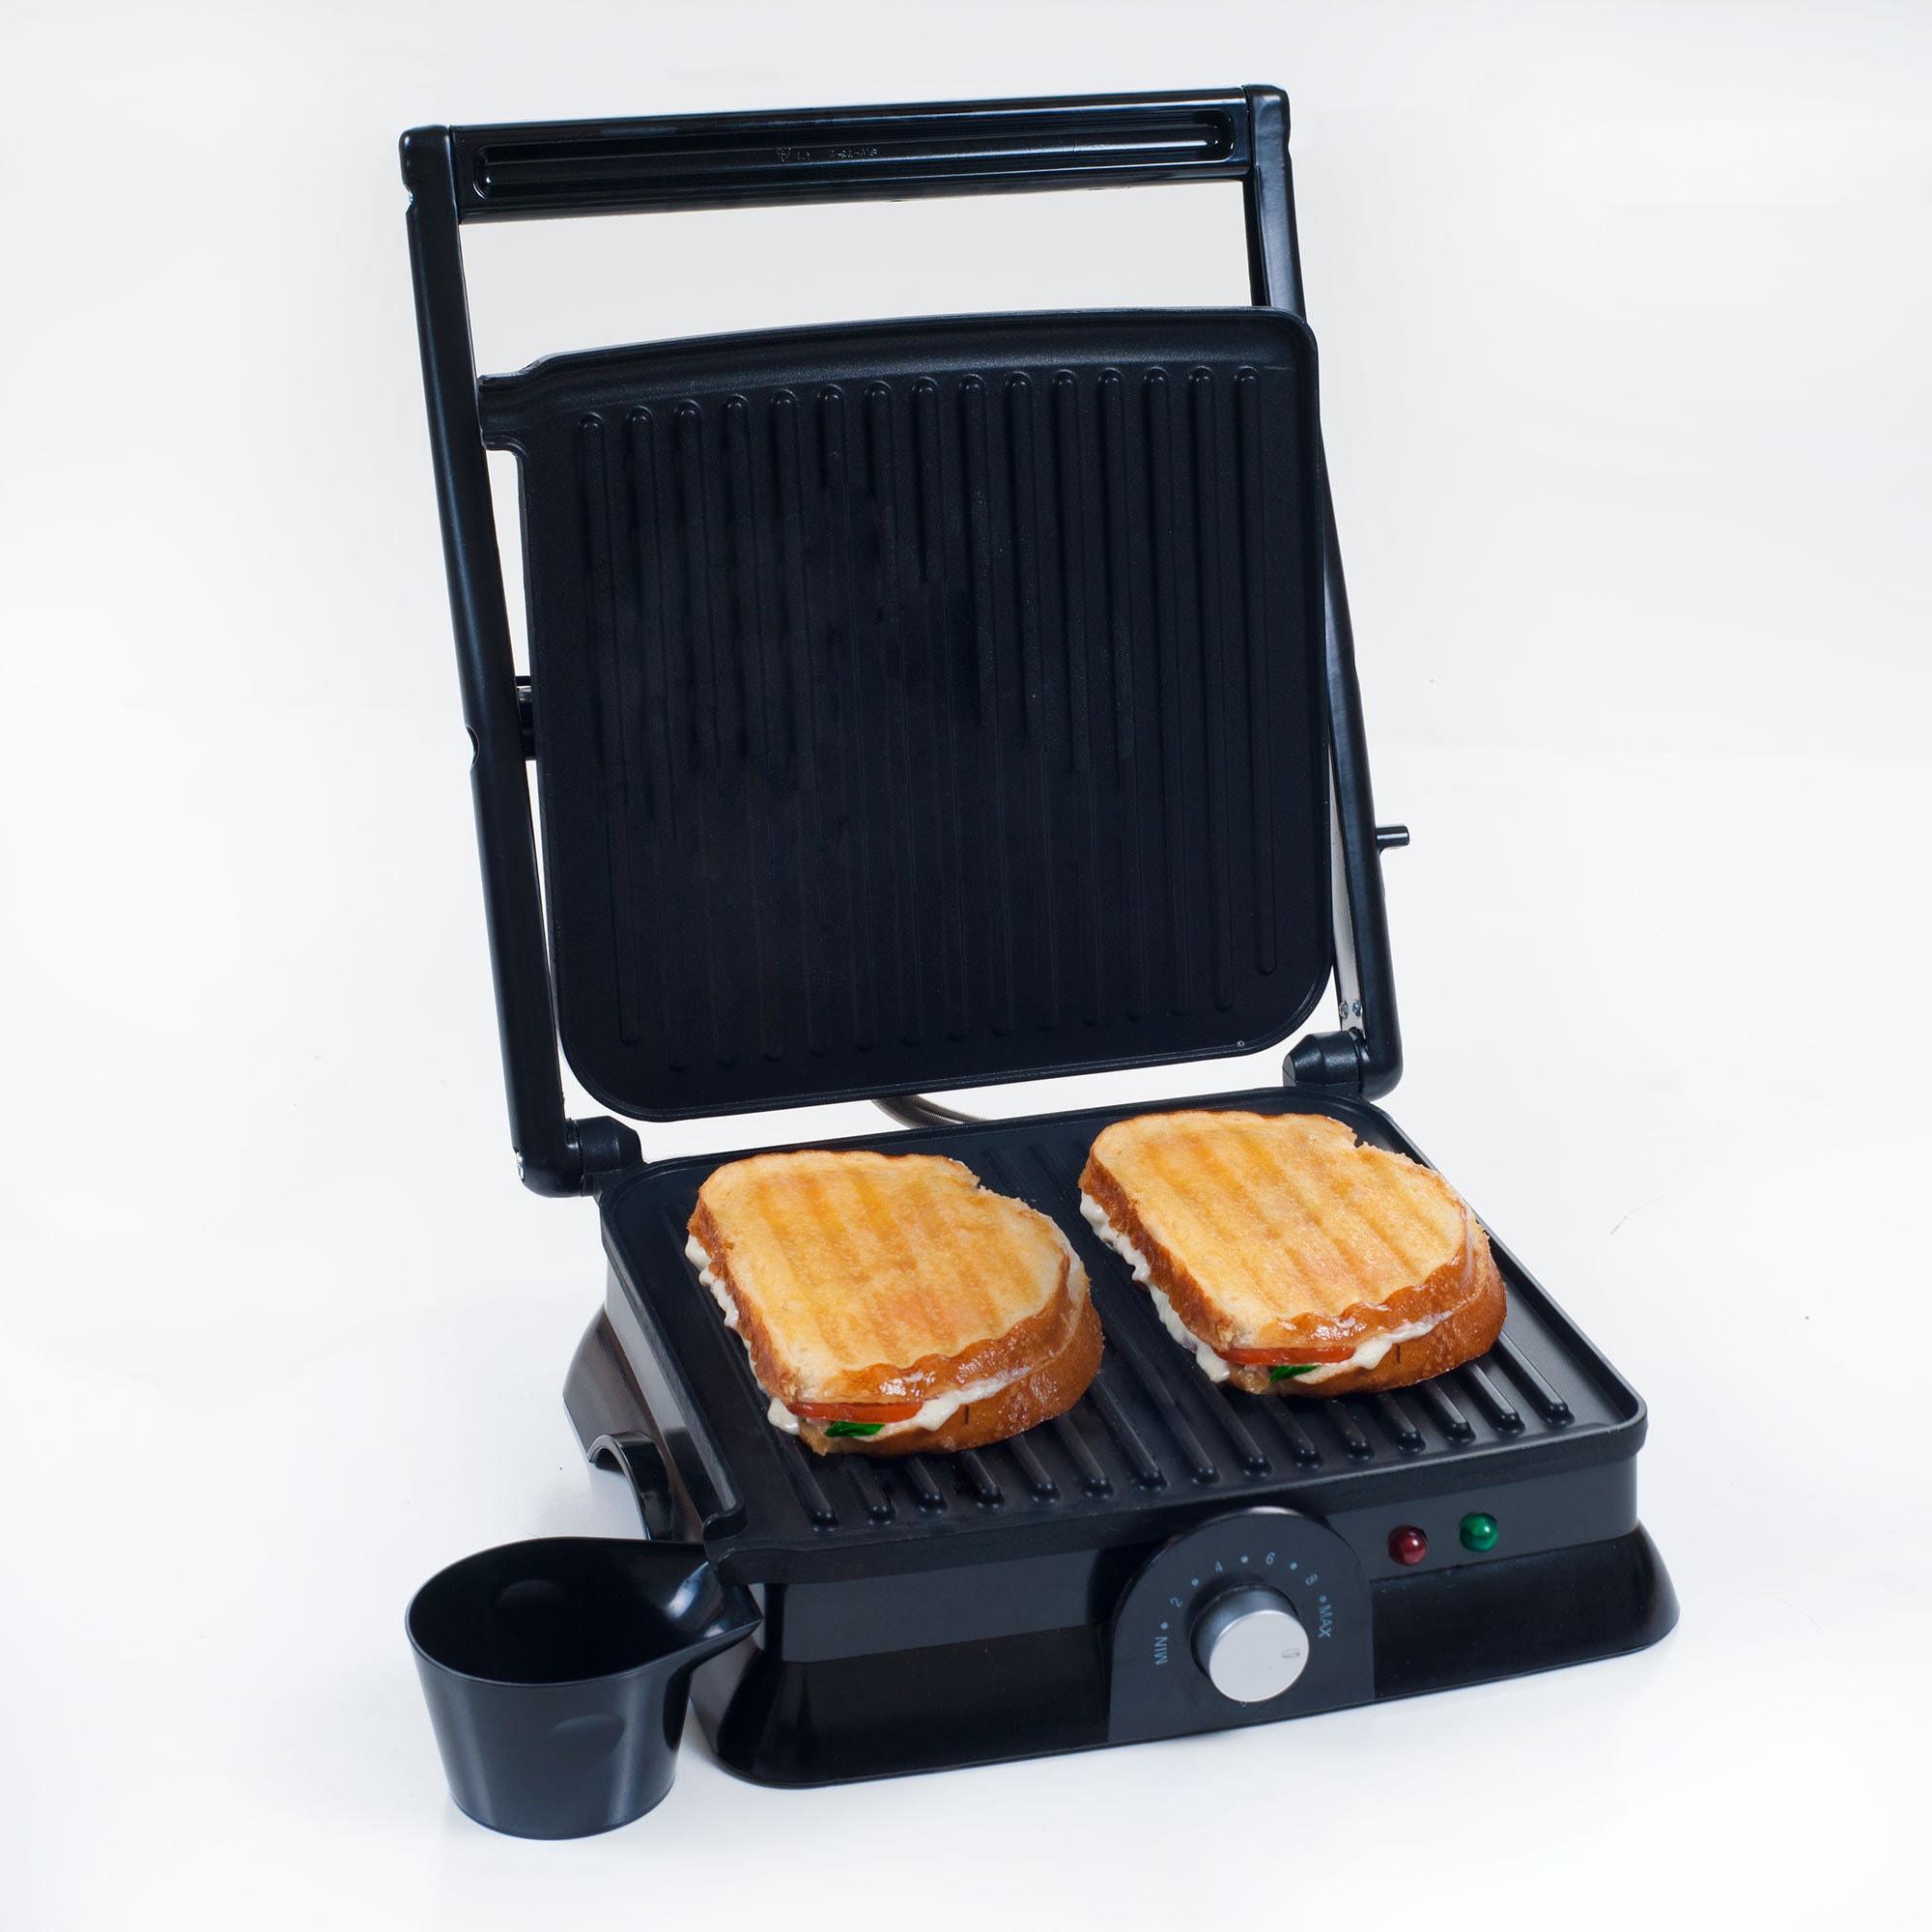 Indoor Grill and Gourmet Sandwich Maker, Panini Press, El...